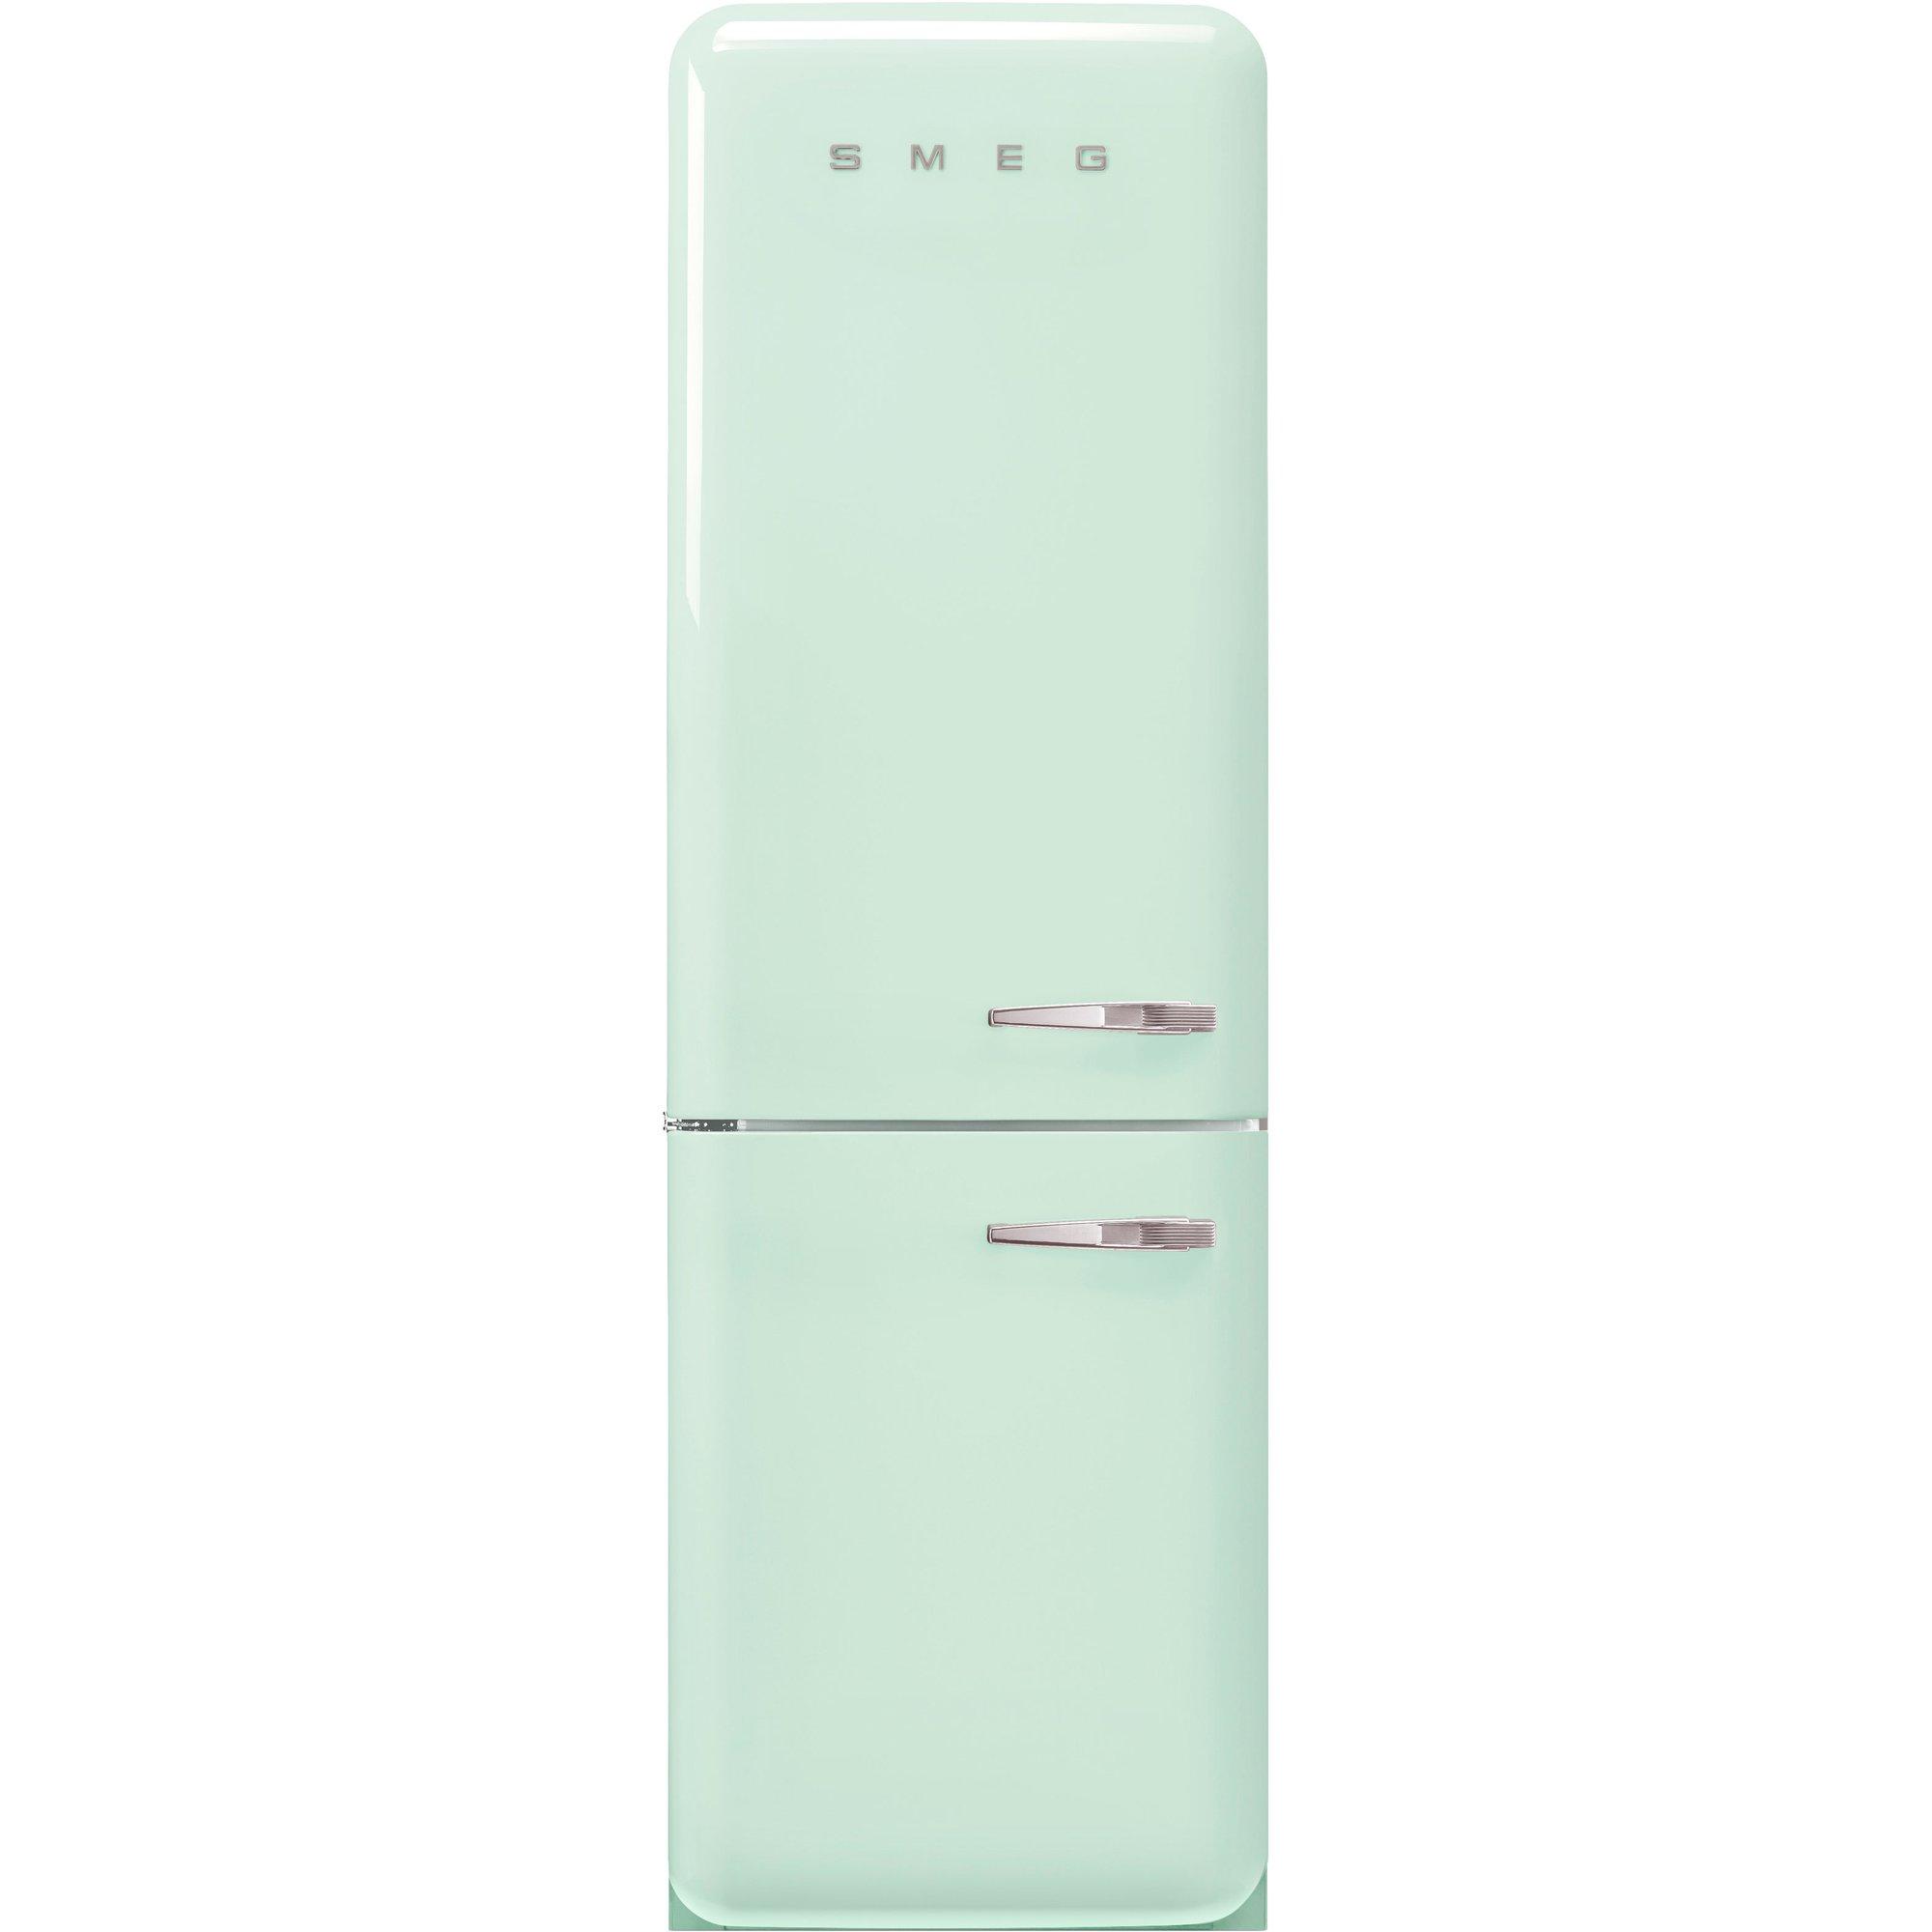 Smeg FAB32LPG5 Køle-/fryseskab pastelgrøn